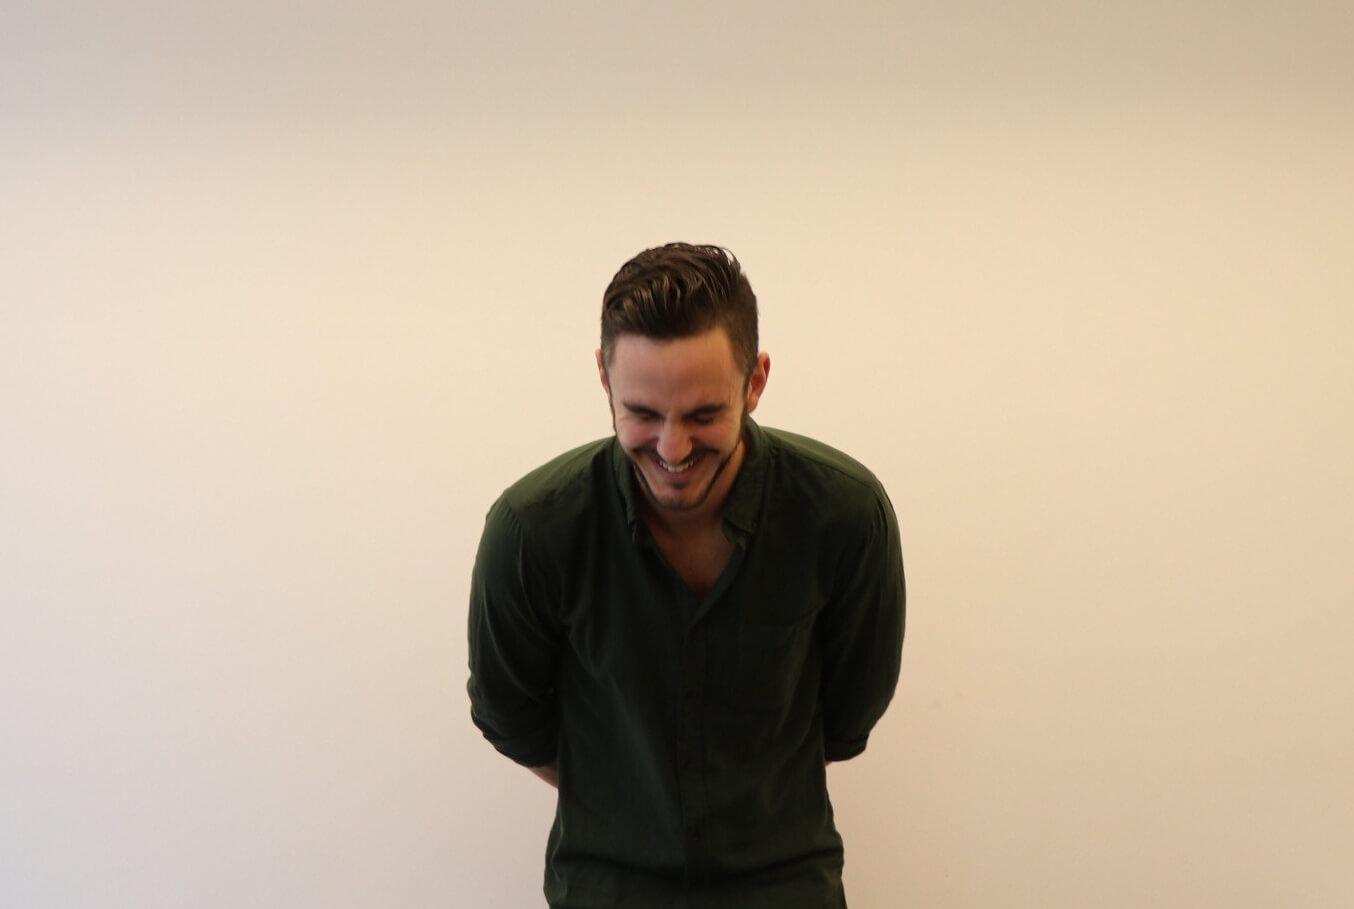 Tom-laughing-inaugural-speech